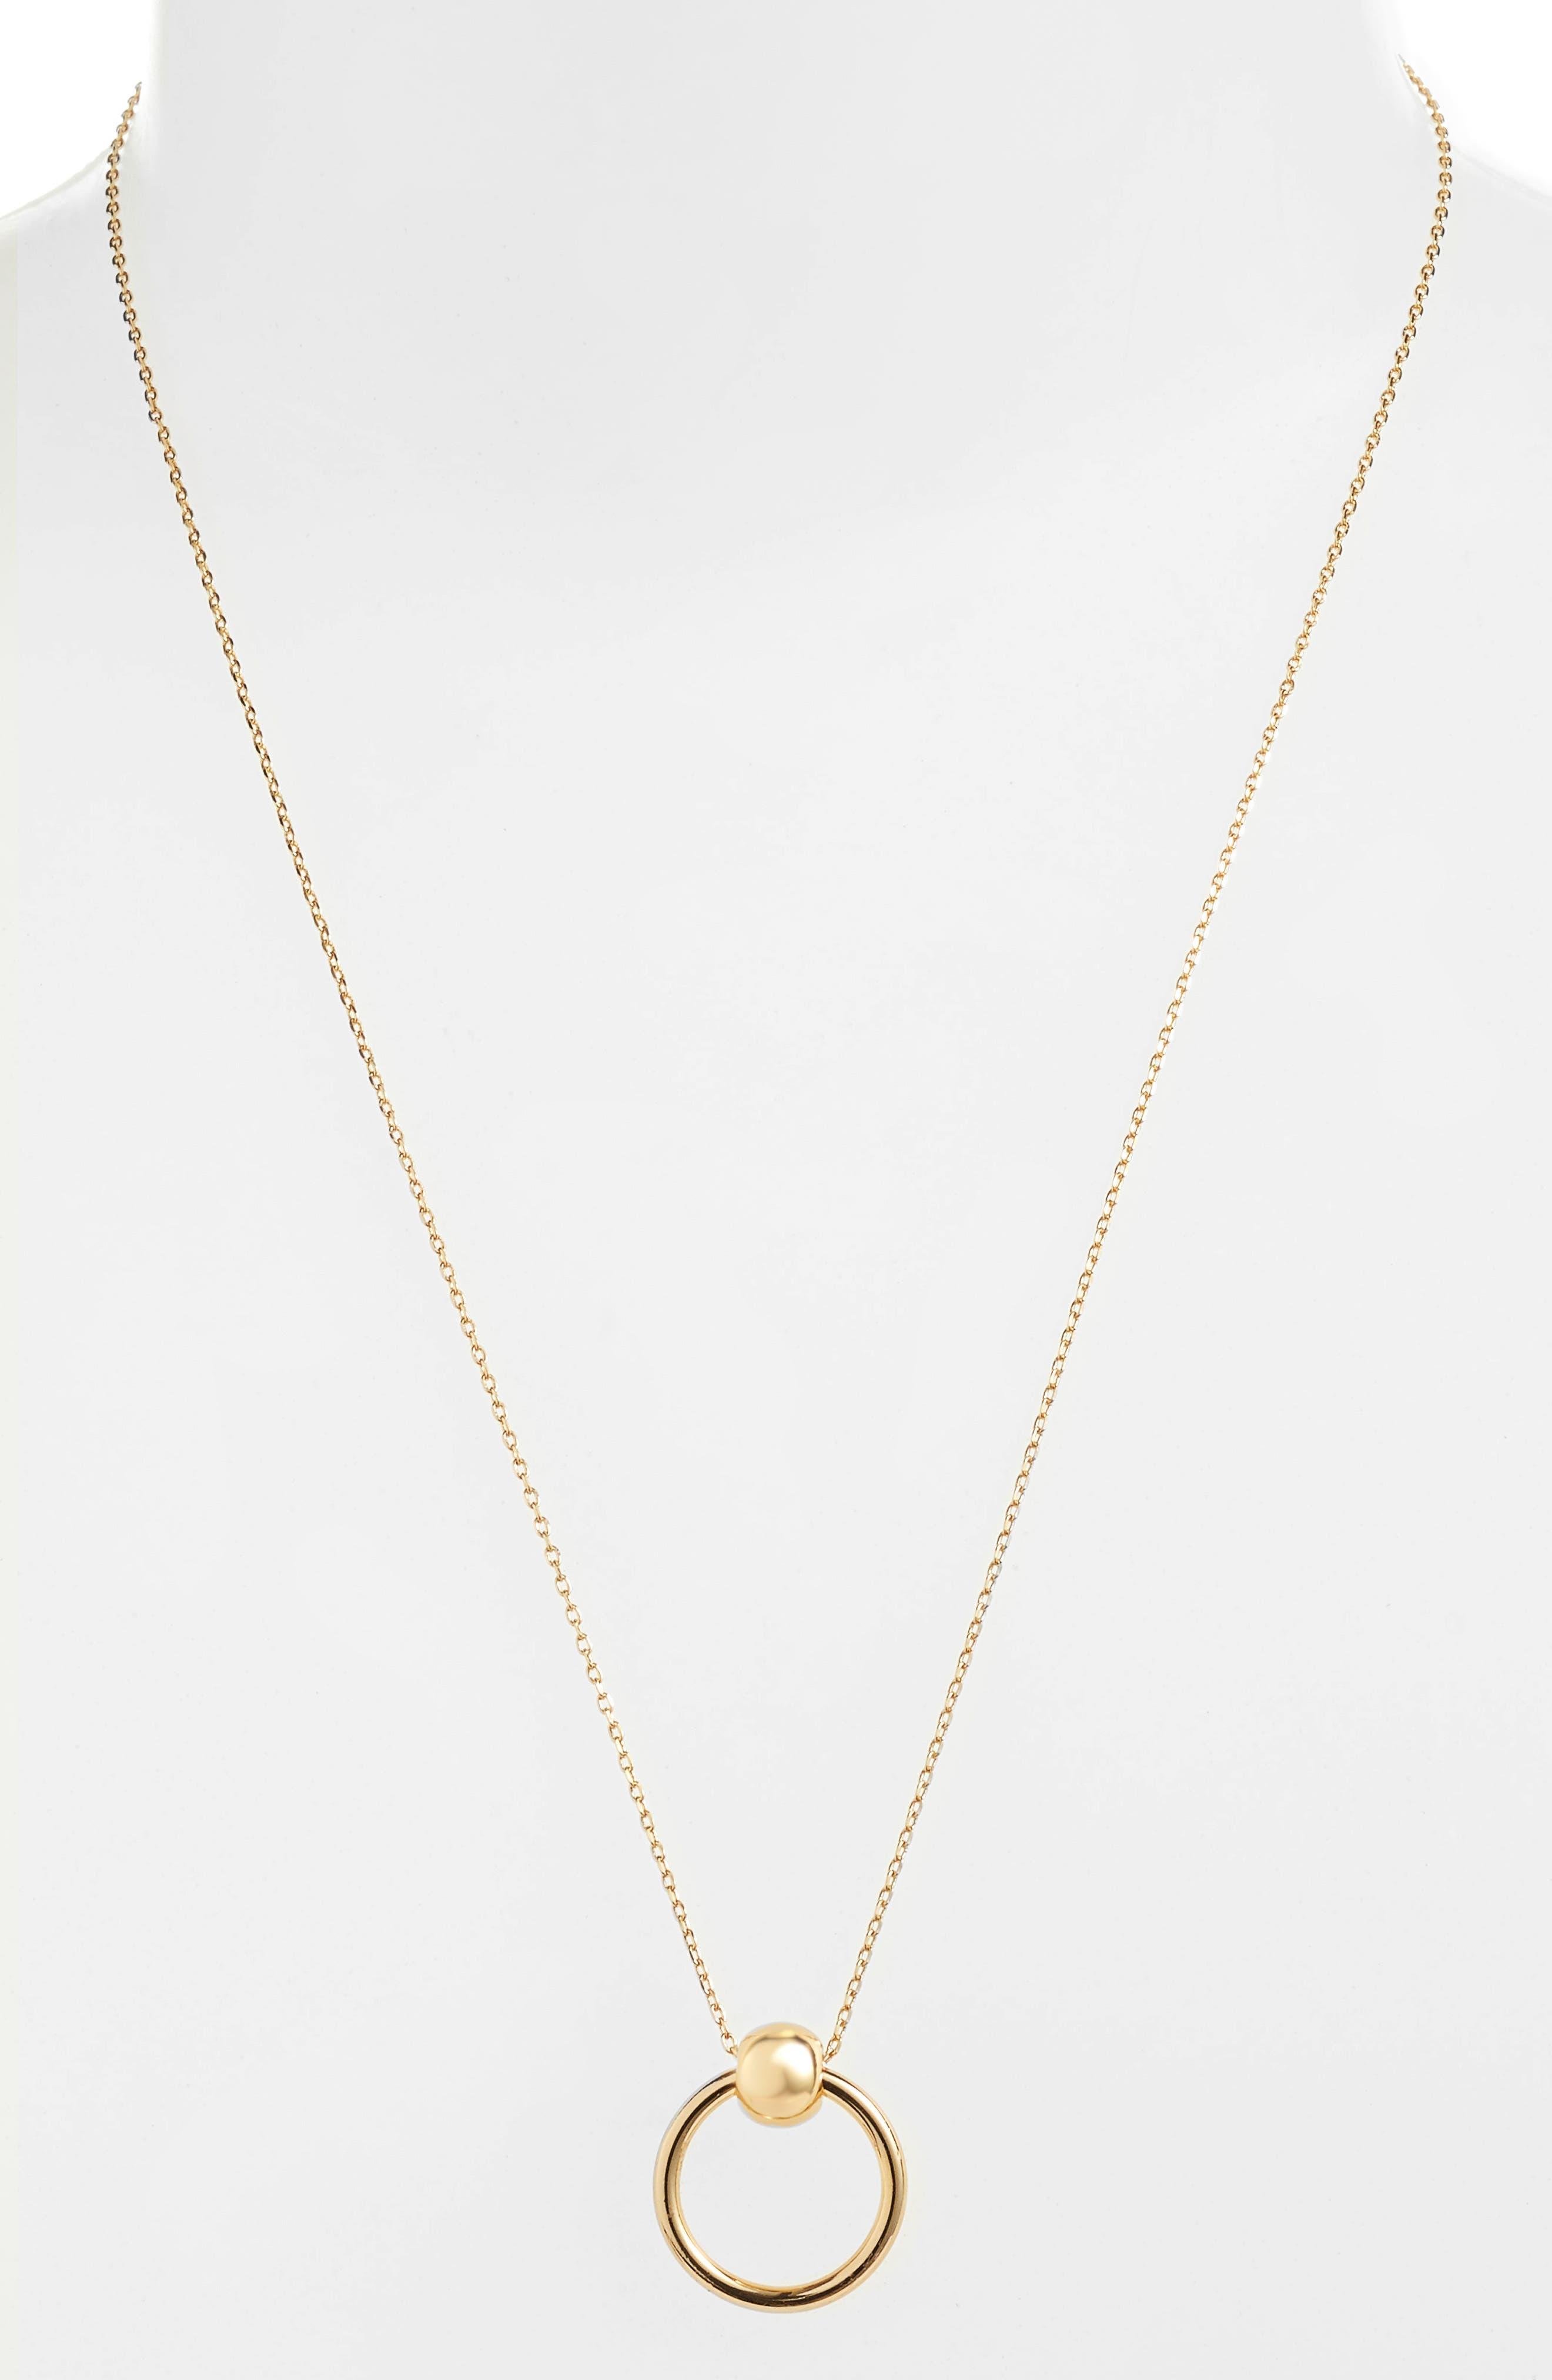 Helix Necklace,                             Main thumbnail 1, color,                             GOLD